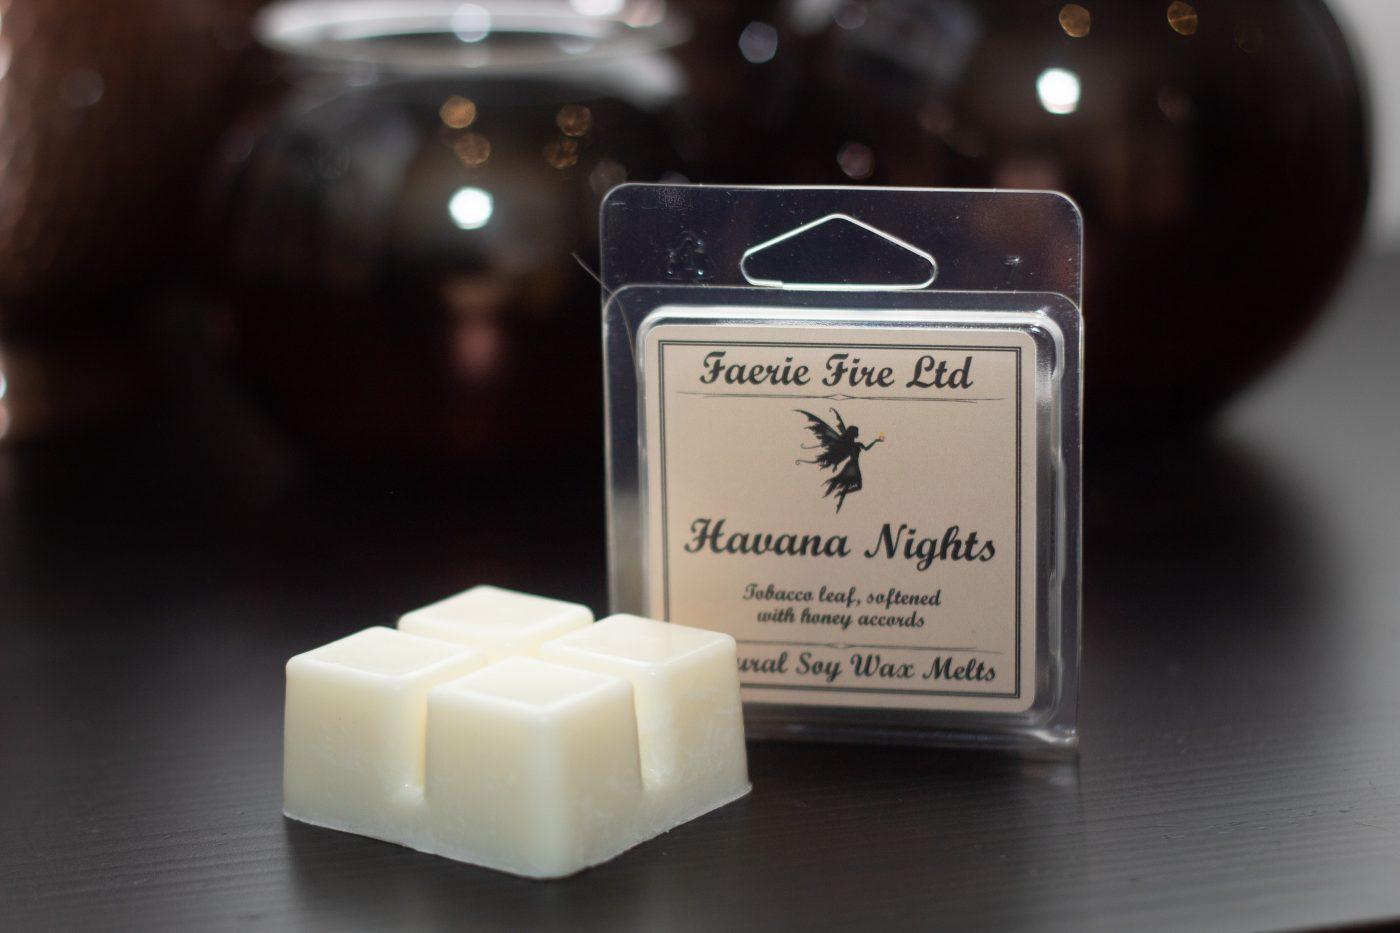 Havana Nights Wax Melt Clam Shell Small 1 scaled